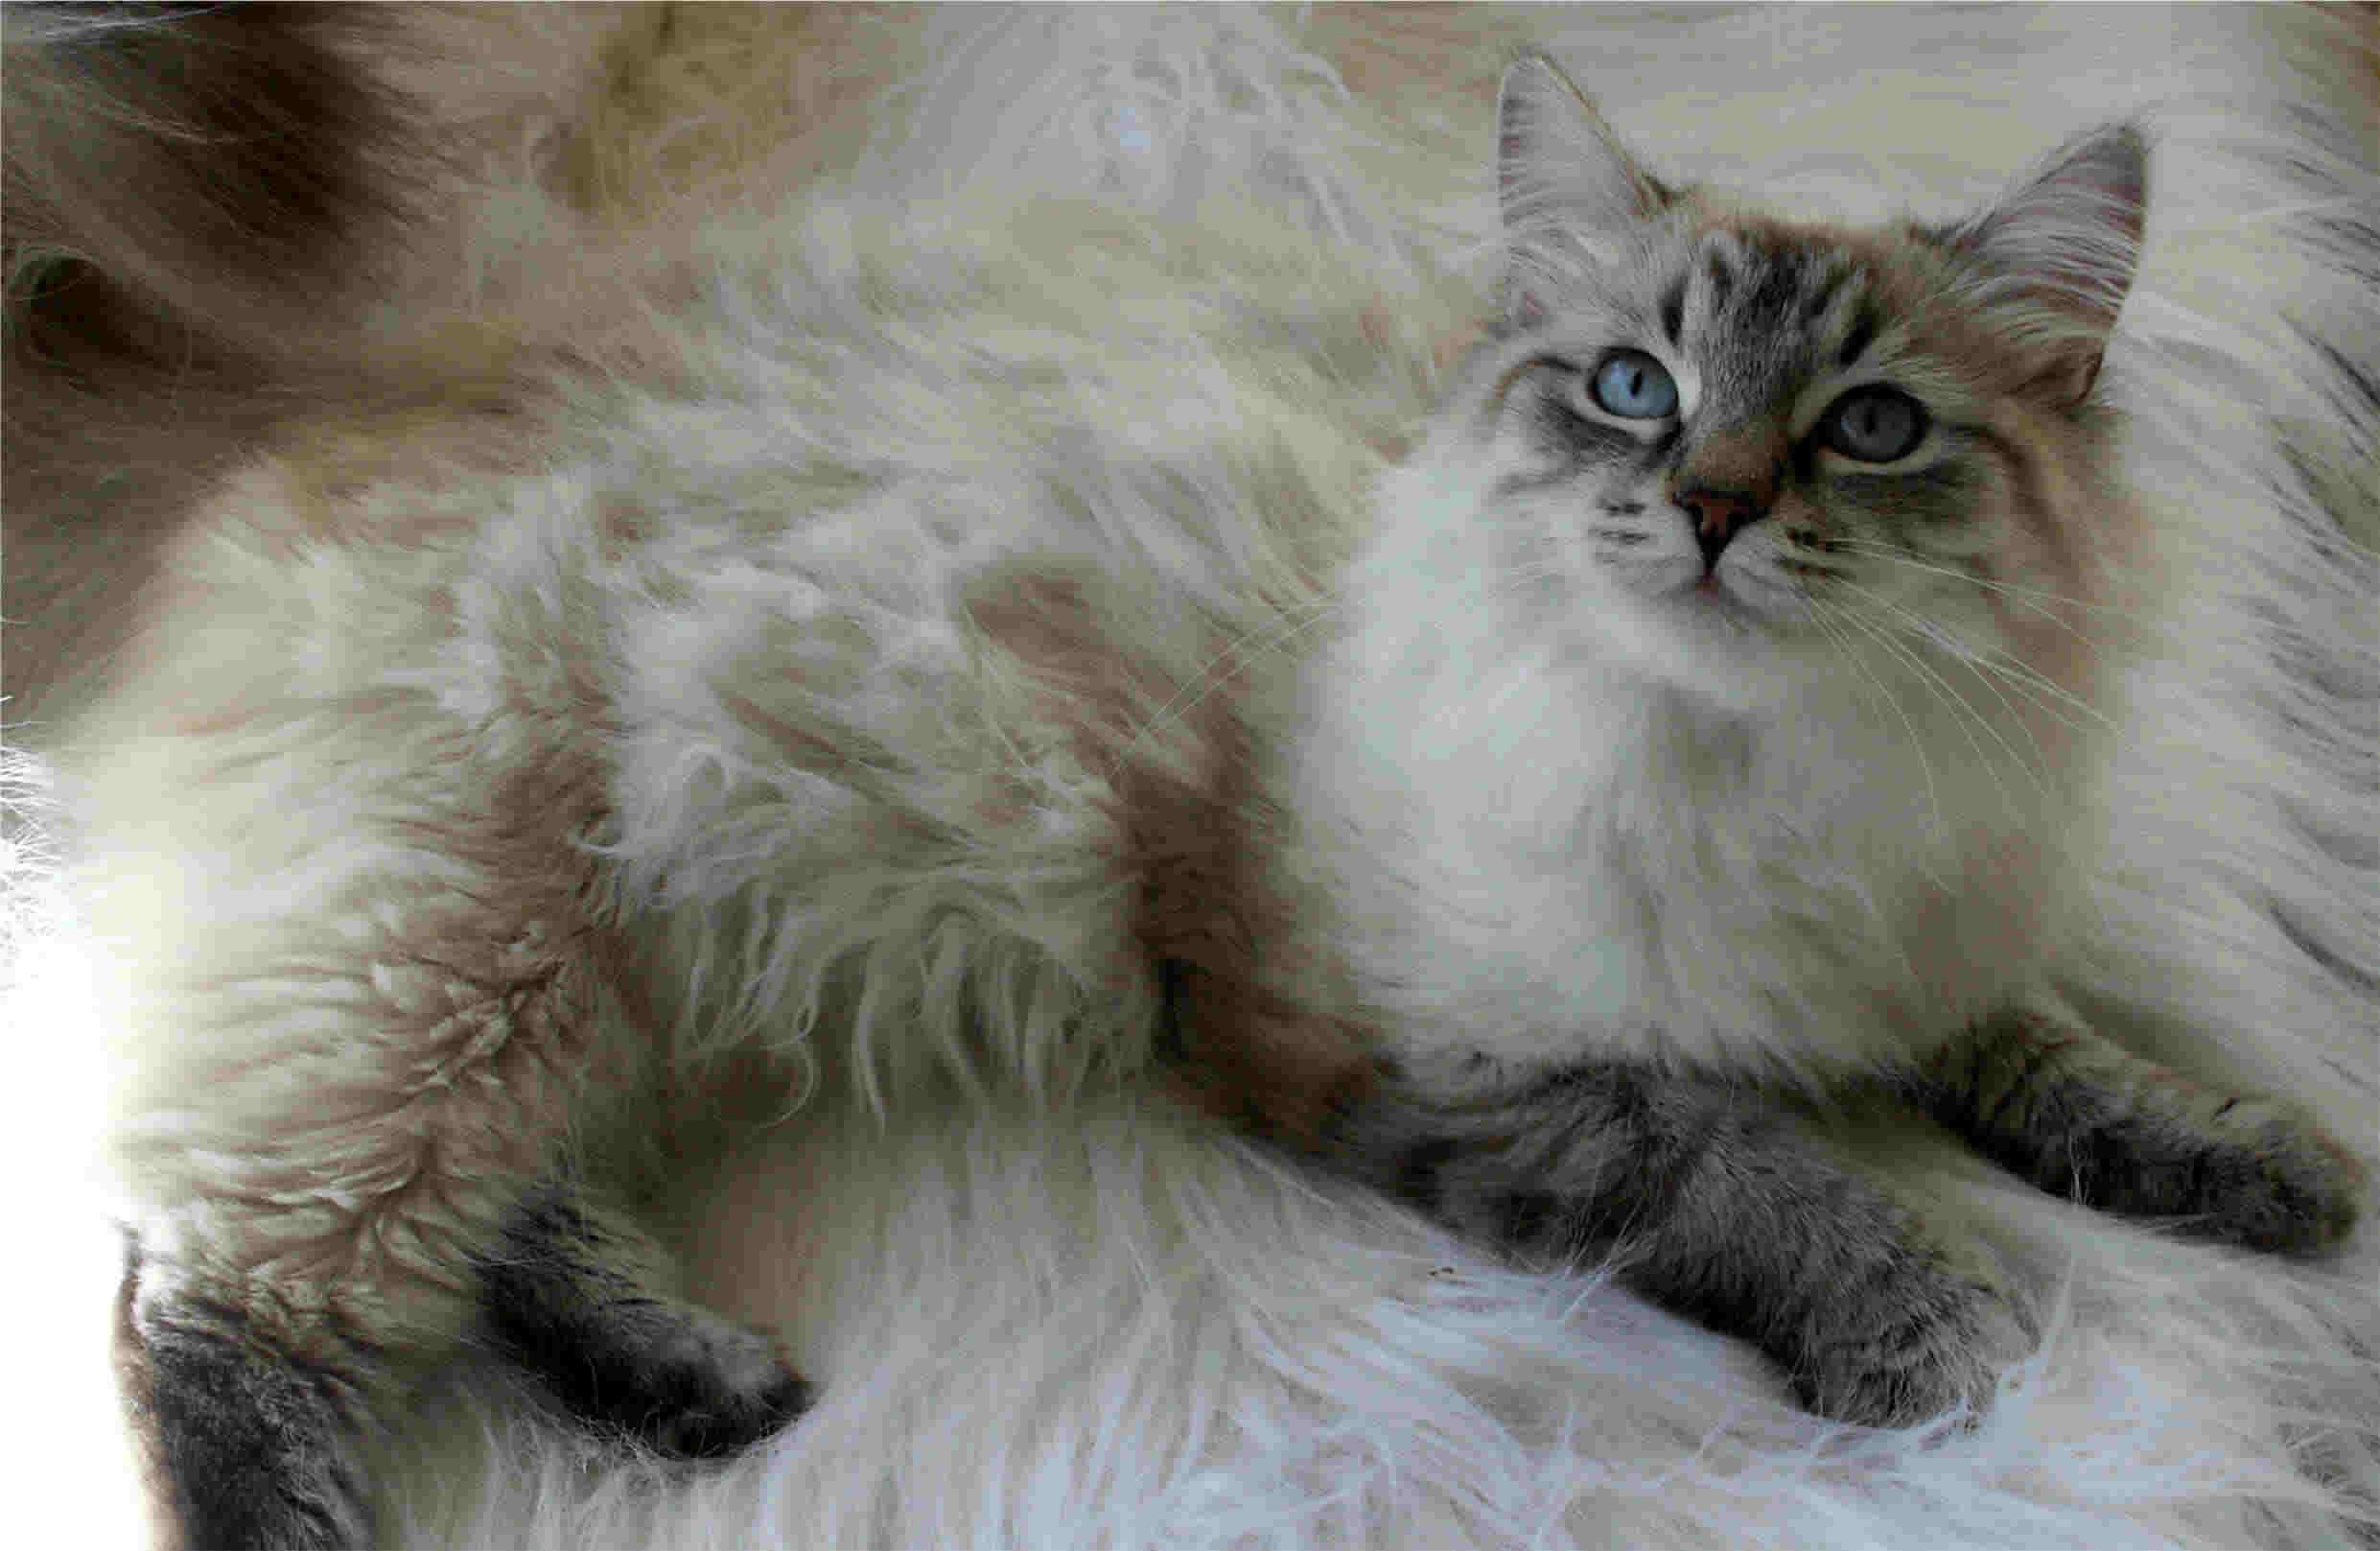 Siberian Kitten: Siberian Siberian Cats Siberian Kittens Ct Siberian Kittens Breed